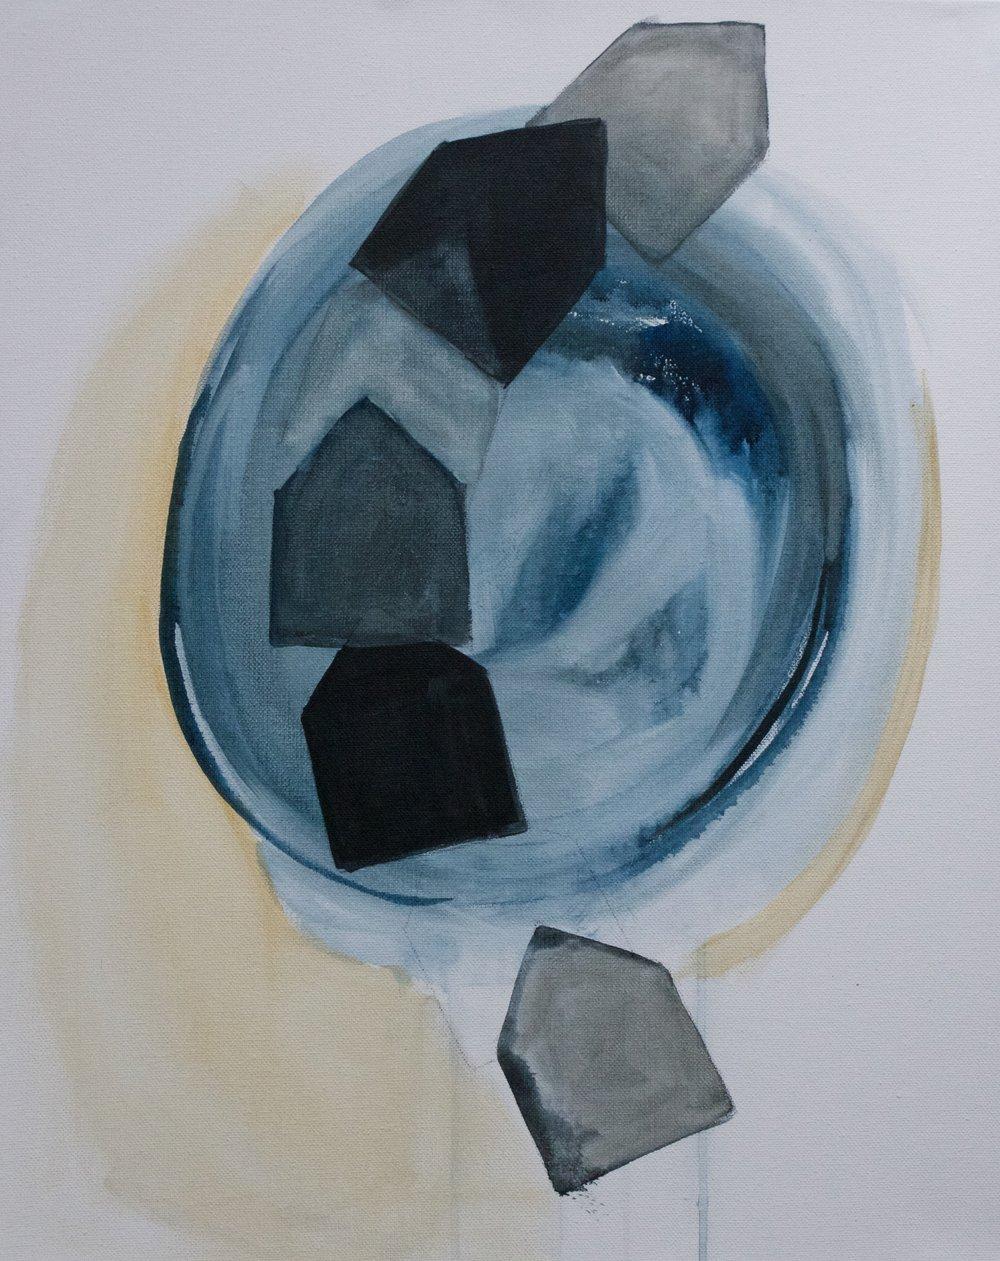 "ORBIT 16 x 20"" acrylic on canvas SOLD"